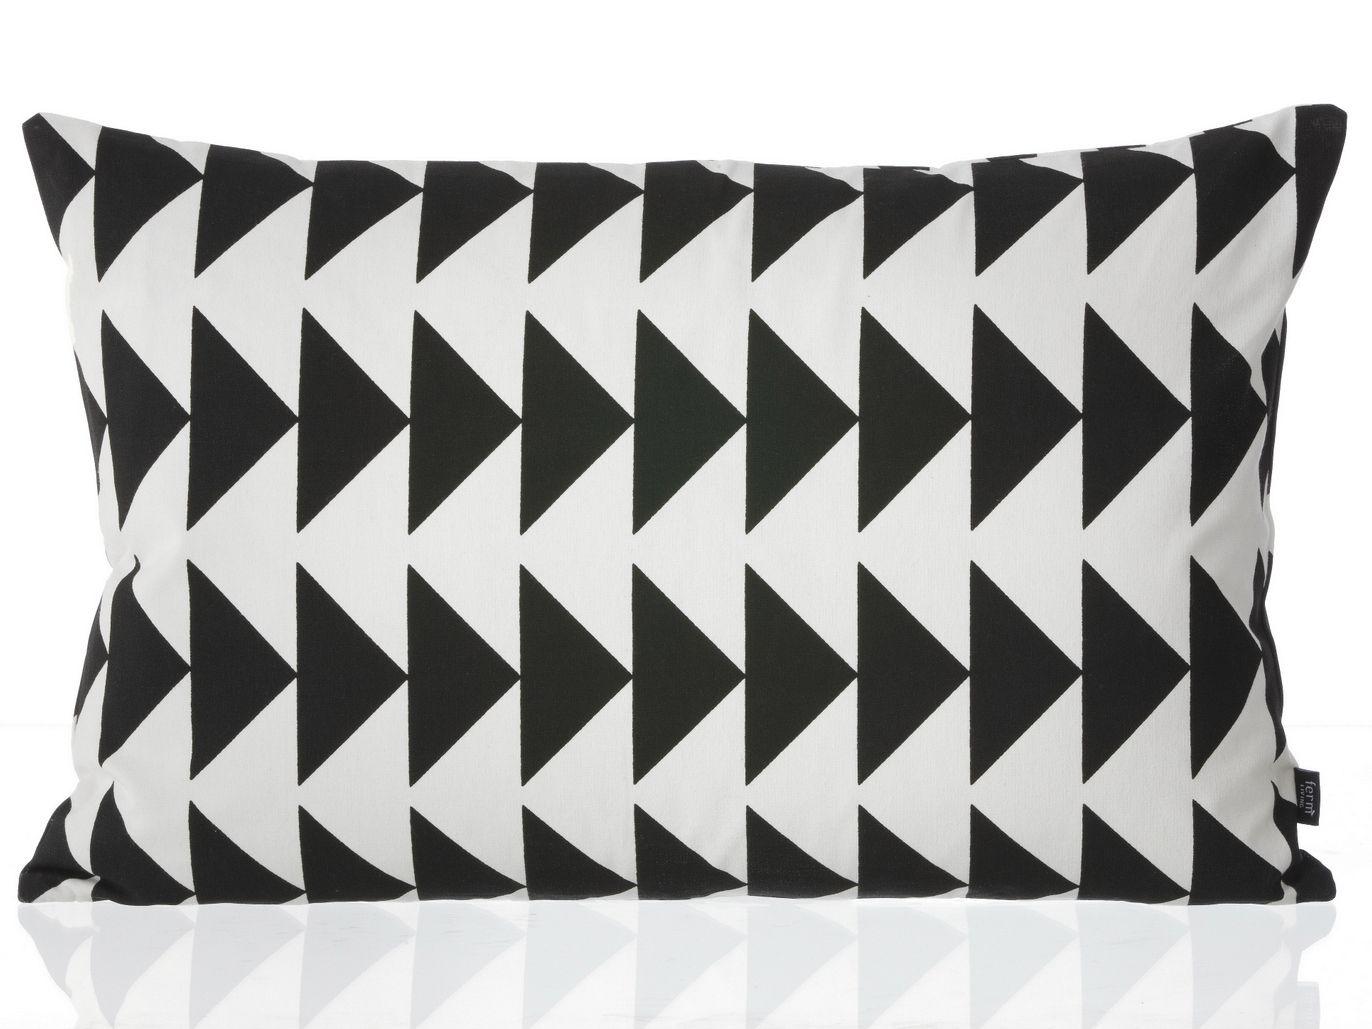 Cuscini Bianchi E Neri cuscino rettangolare in piuma d'oca collezione black arrow